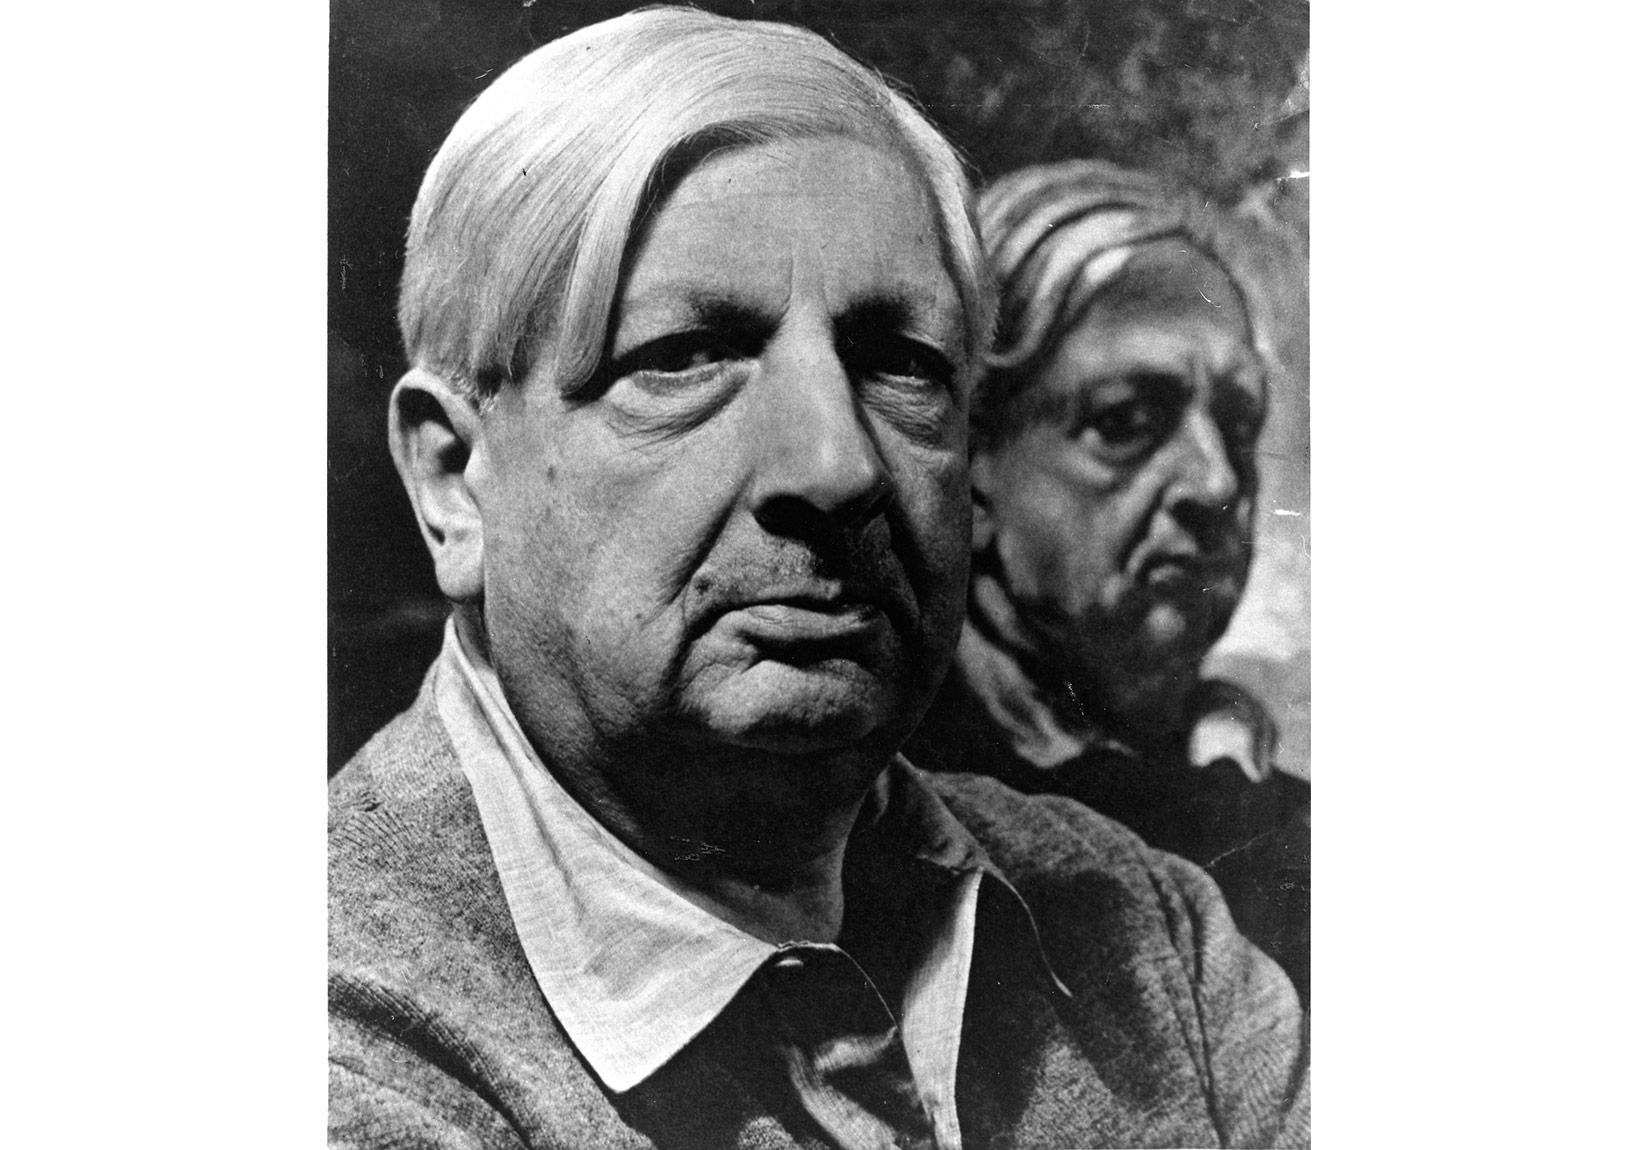 İkili Portre, Zırhlı Otoportre ile birlikte (1948), fotoğraf: Philippe Halsman, 1951Giorgio ve Isa de Chirico Vakfı Koleksiyonu